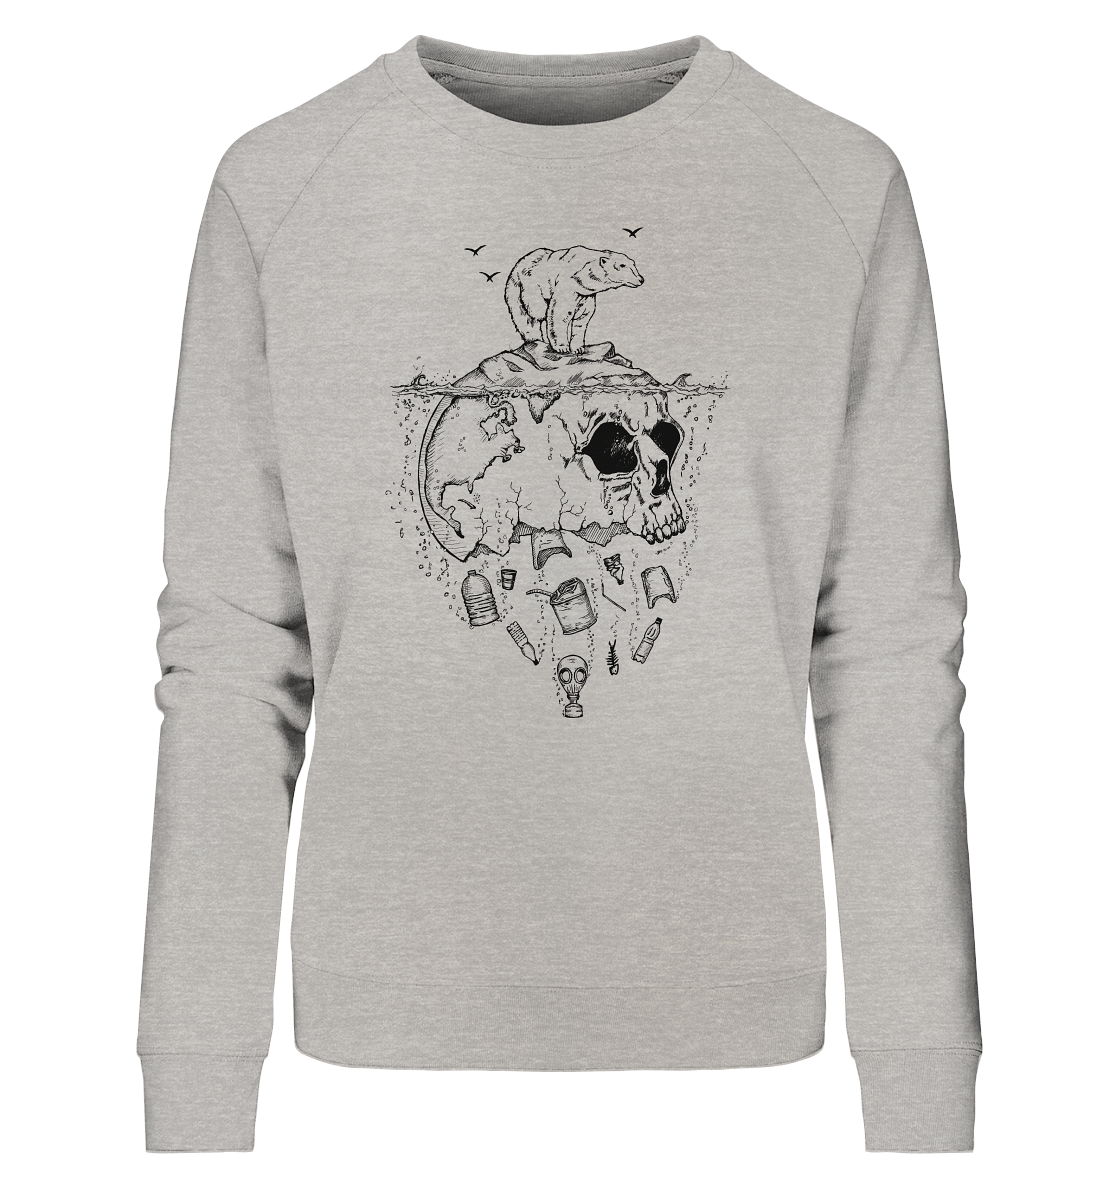 front-ladies-organic-sweatshirt-c2c1c0-1116x-3.png